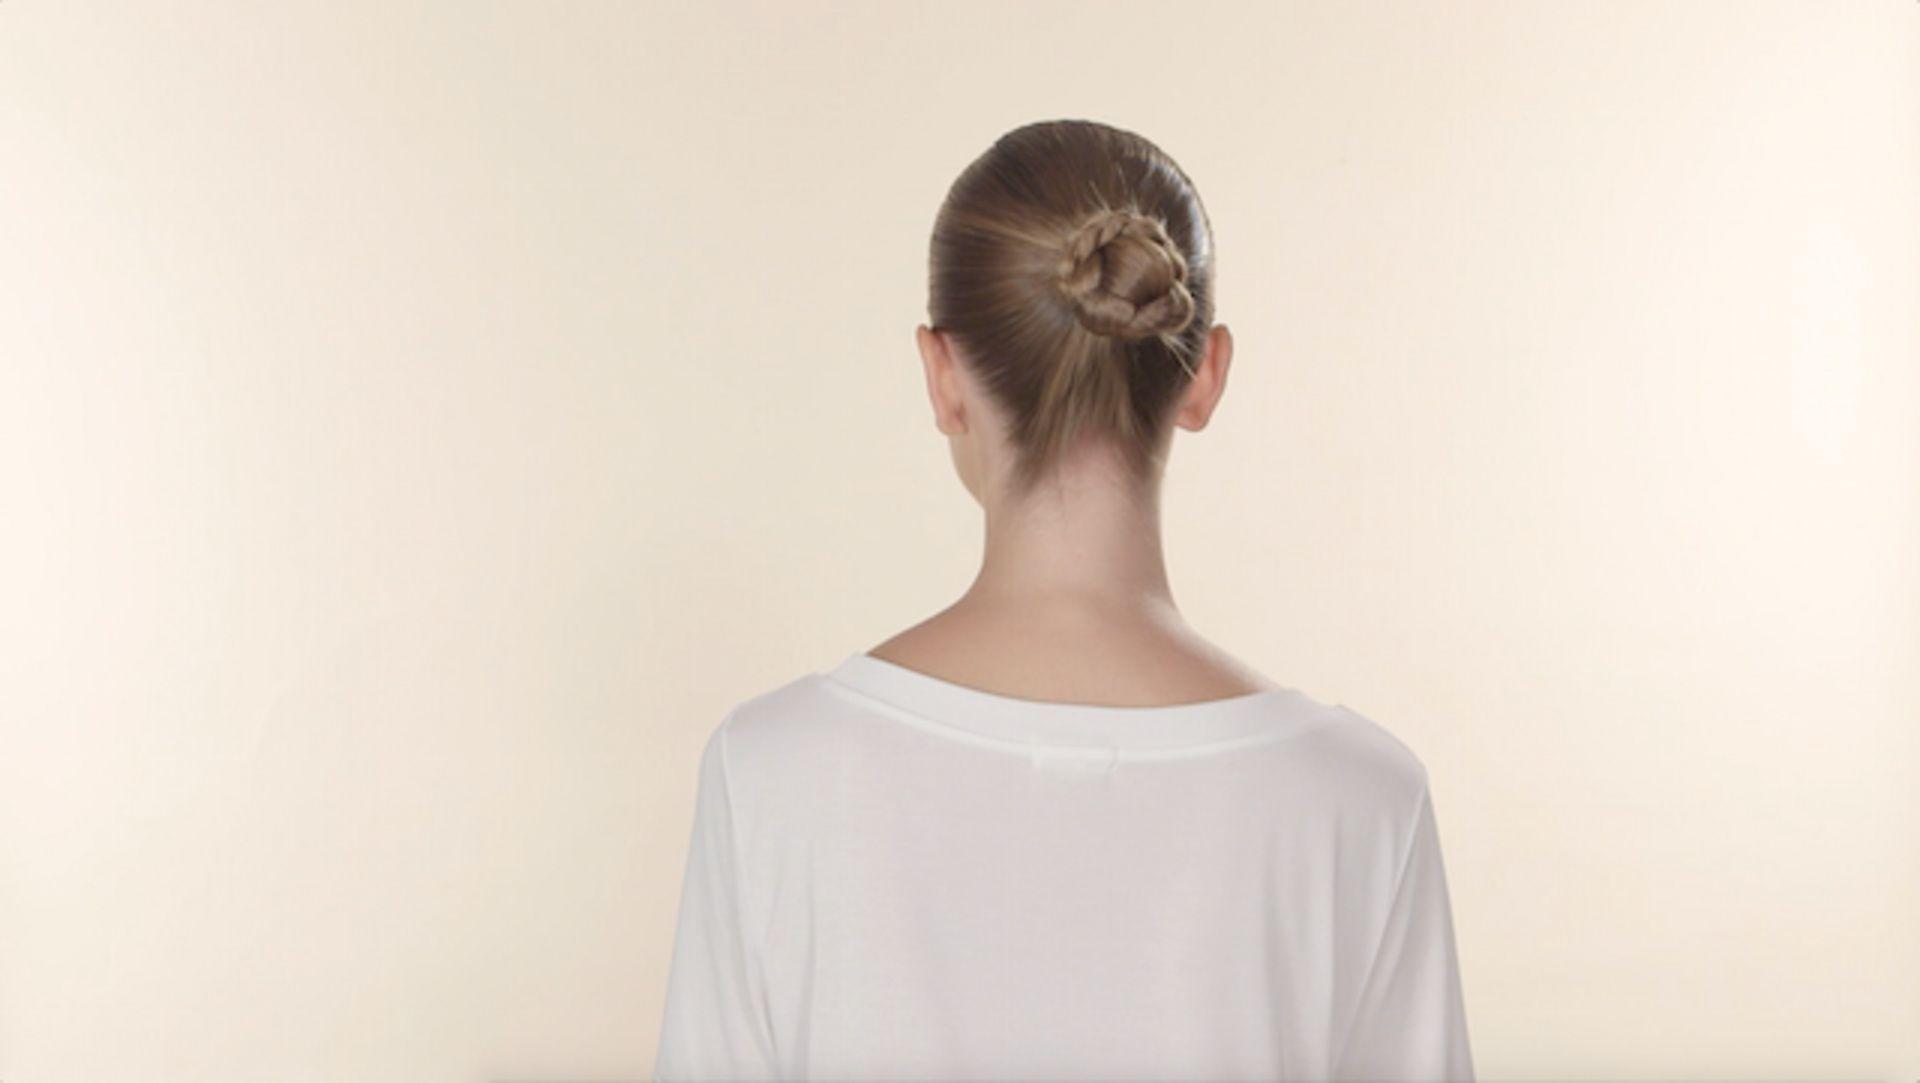 Hair Styles For A Dance: Beauty Bites: Ballerina Bun Tutorial: This Bun Is So